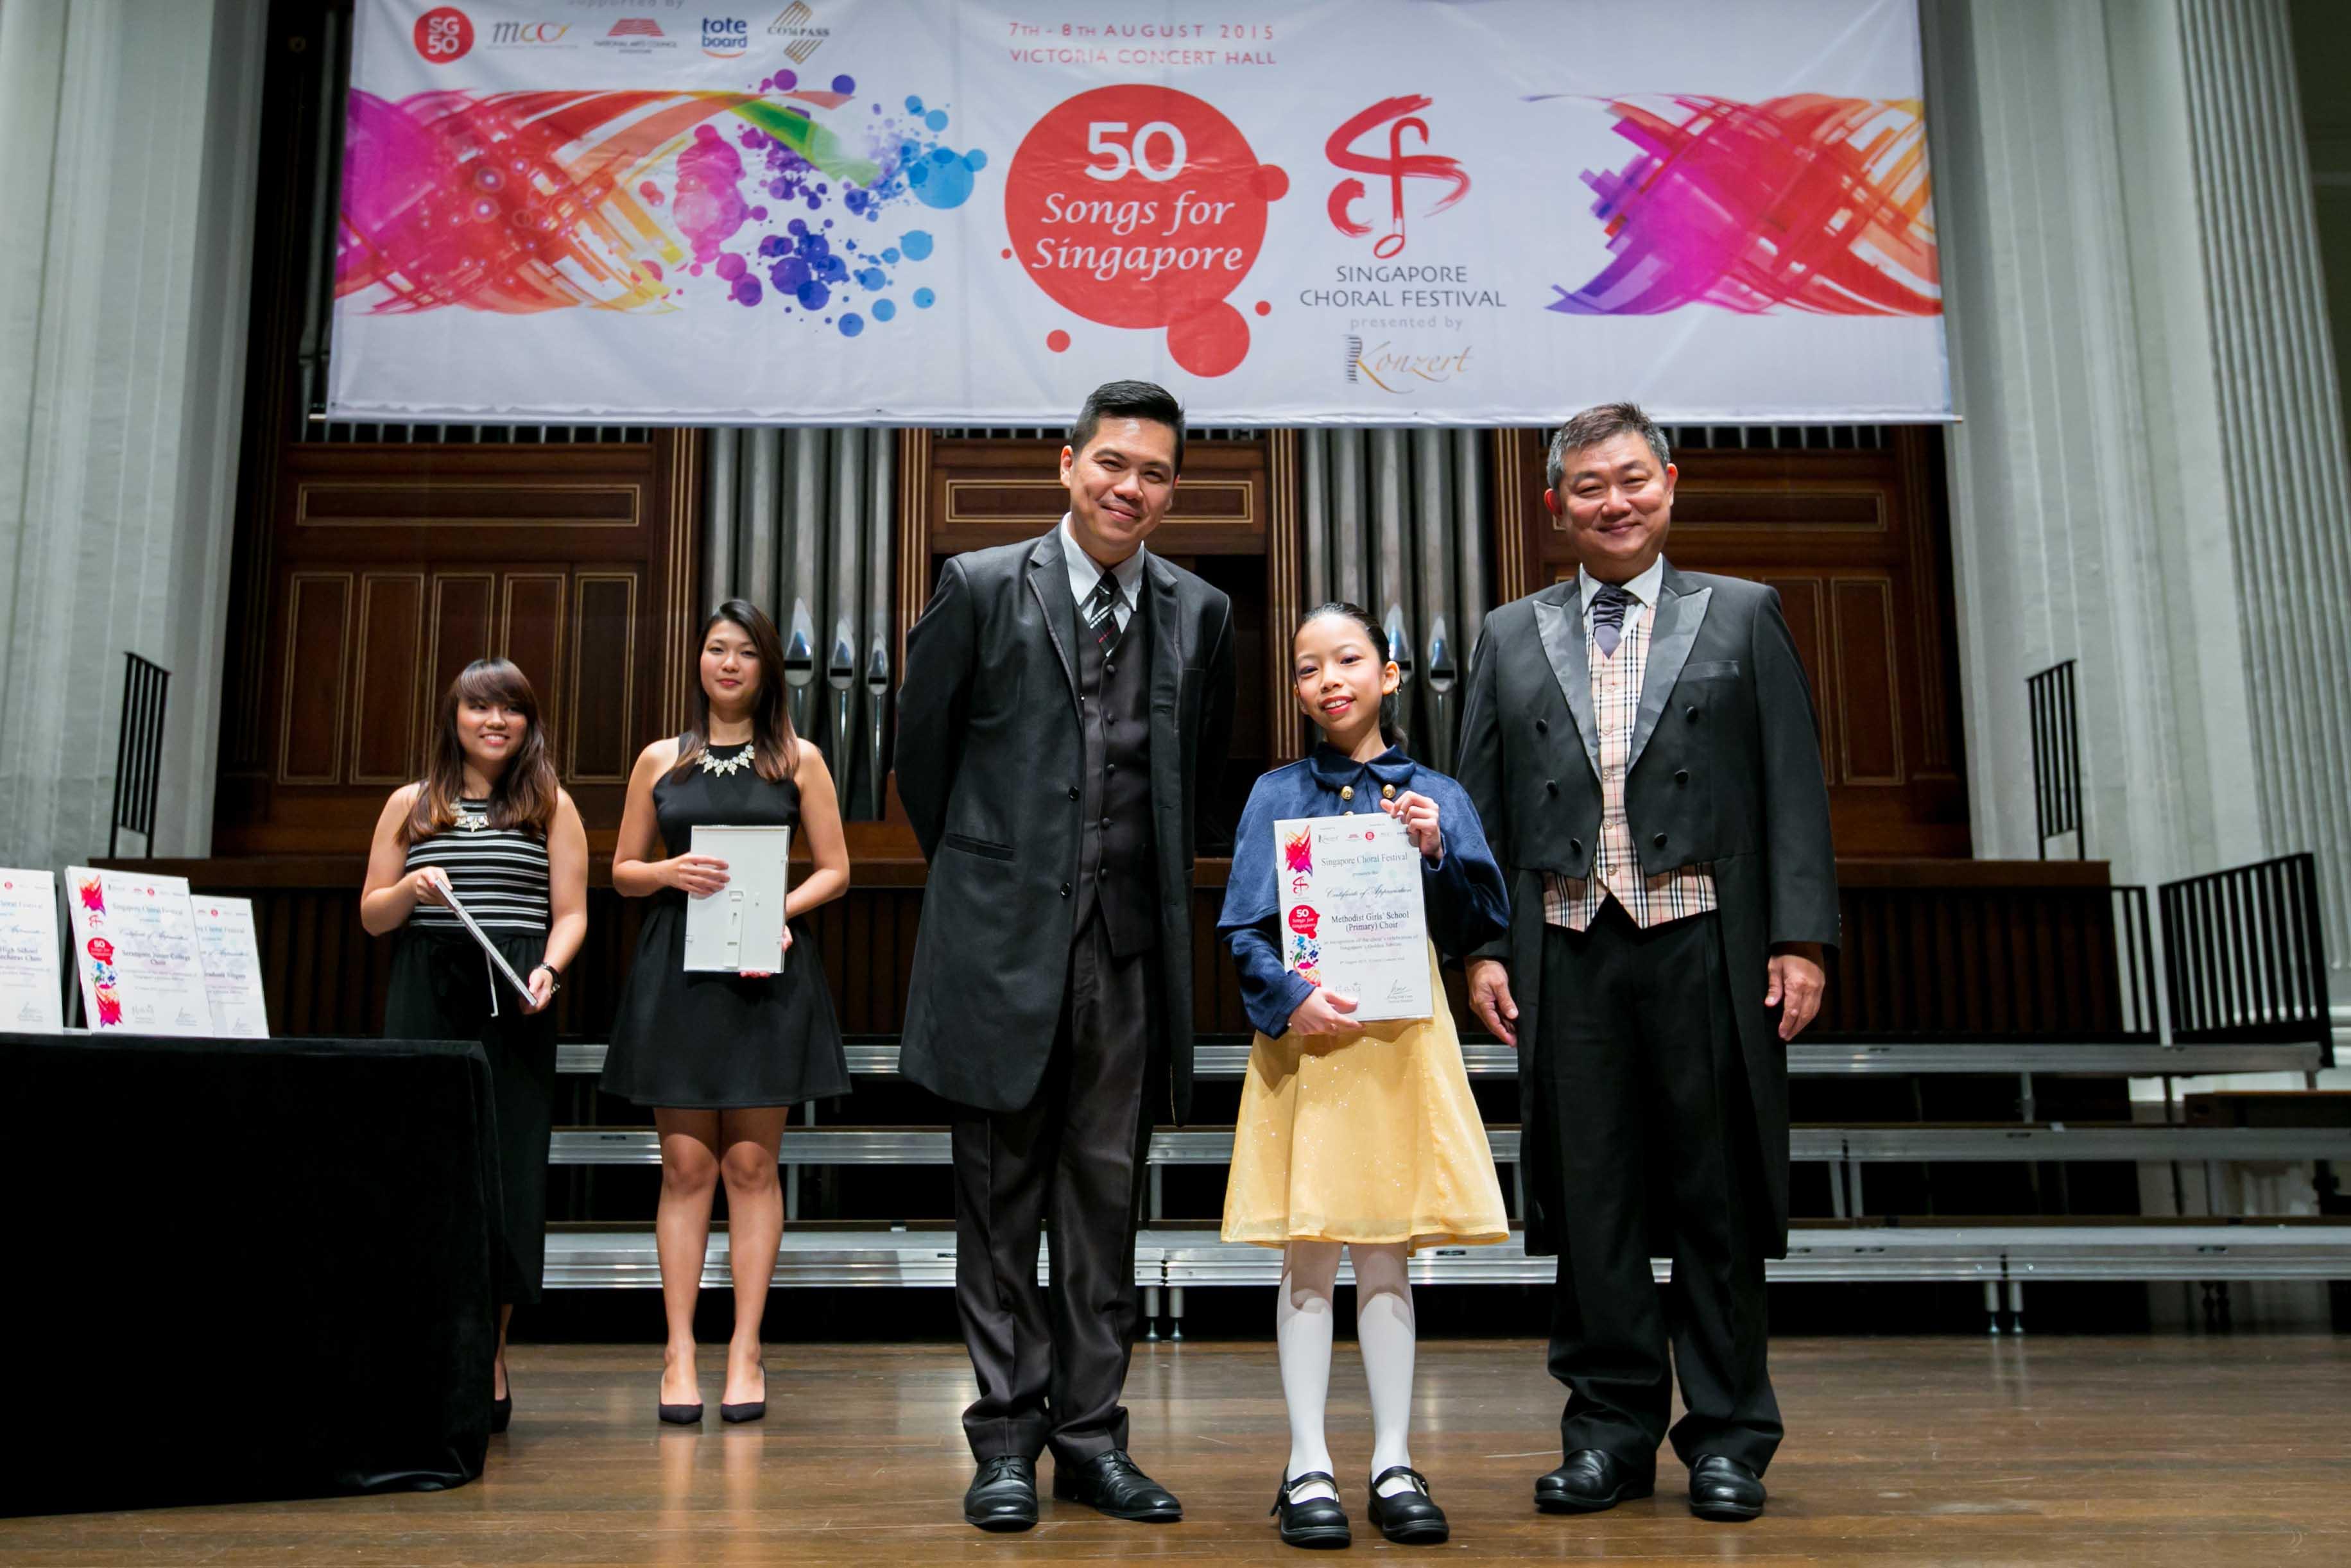 Singapore Choral Festival 8-8-15 (164).jpg